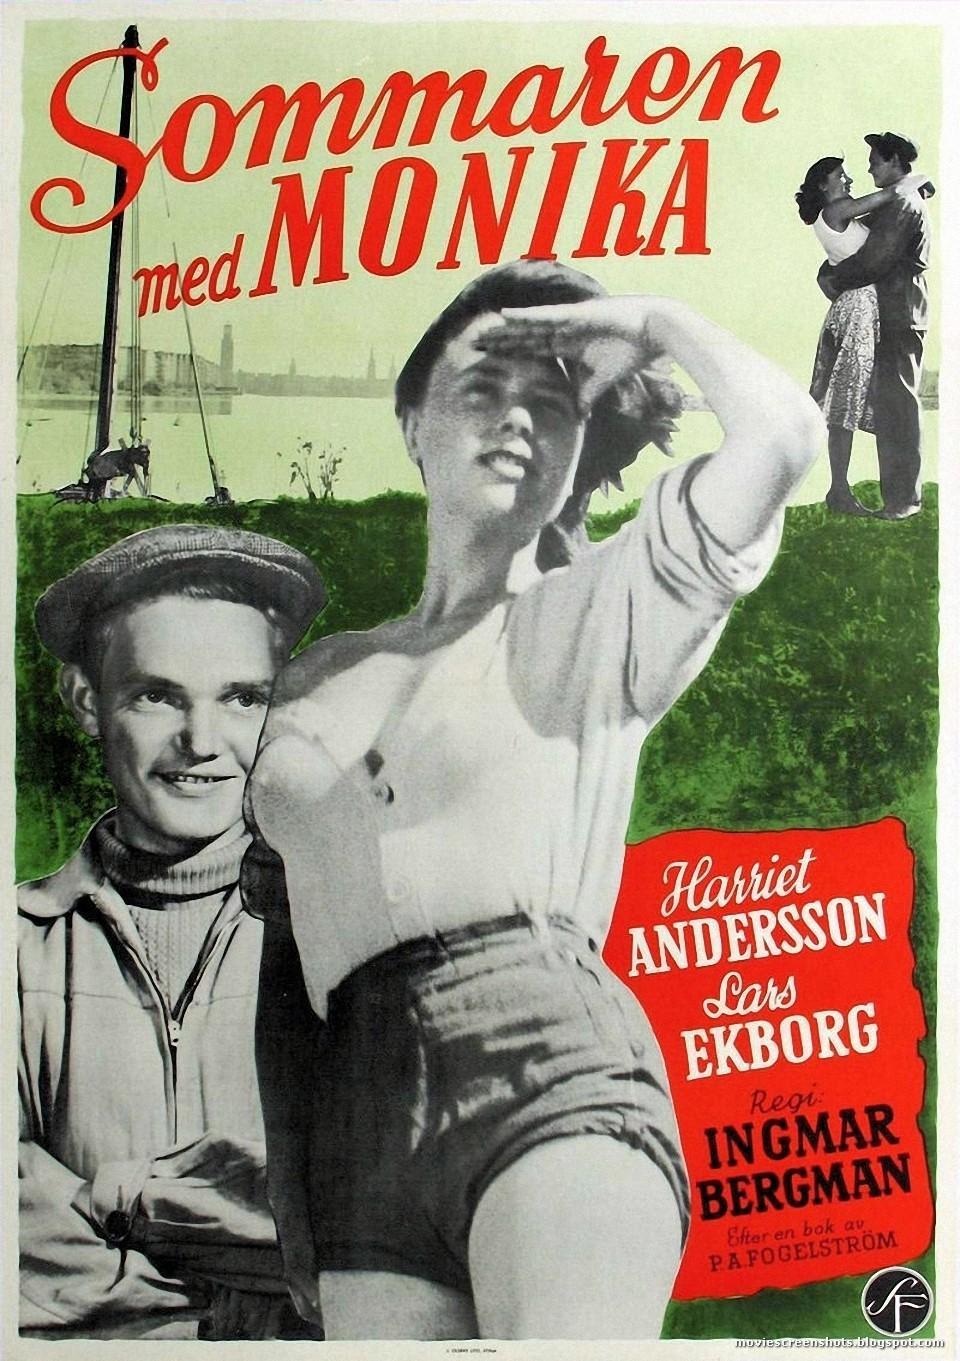 Summer_with_Monika-Sommaren_med_Monika-1953-MSS-poster_03